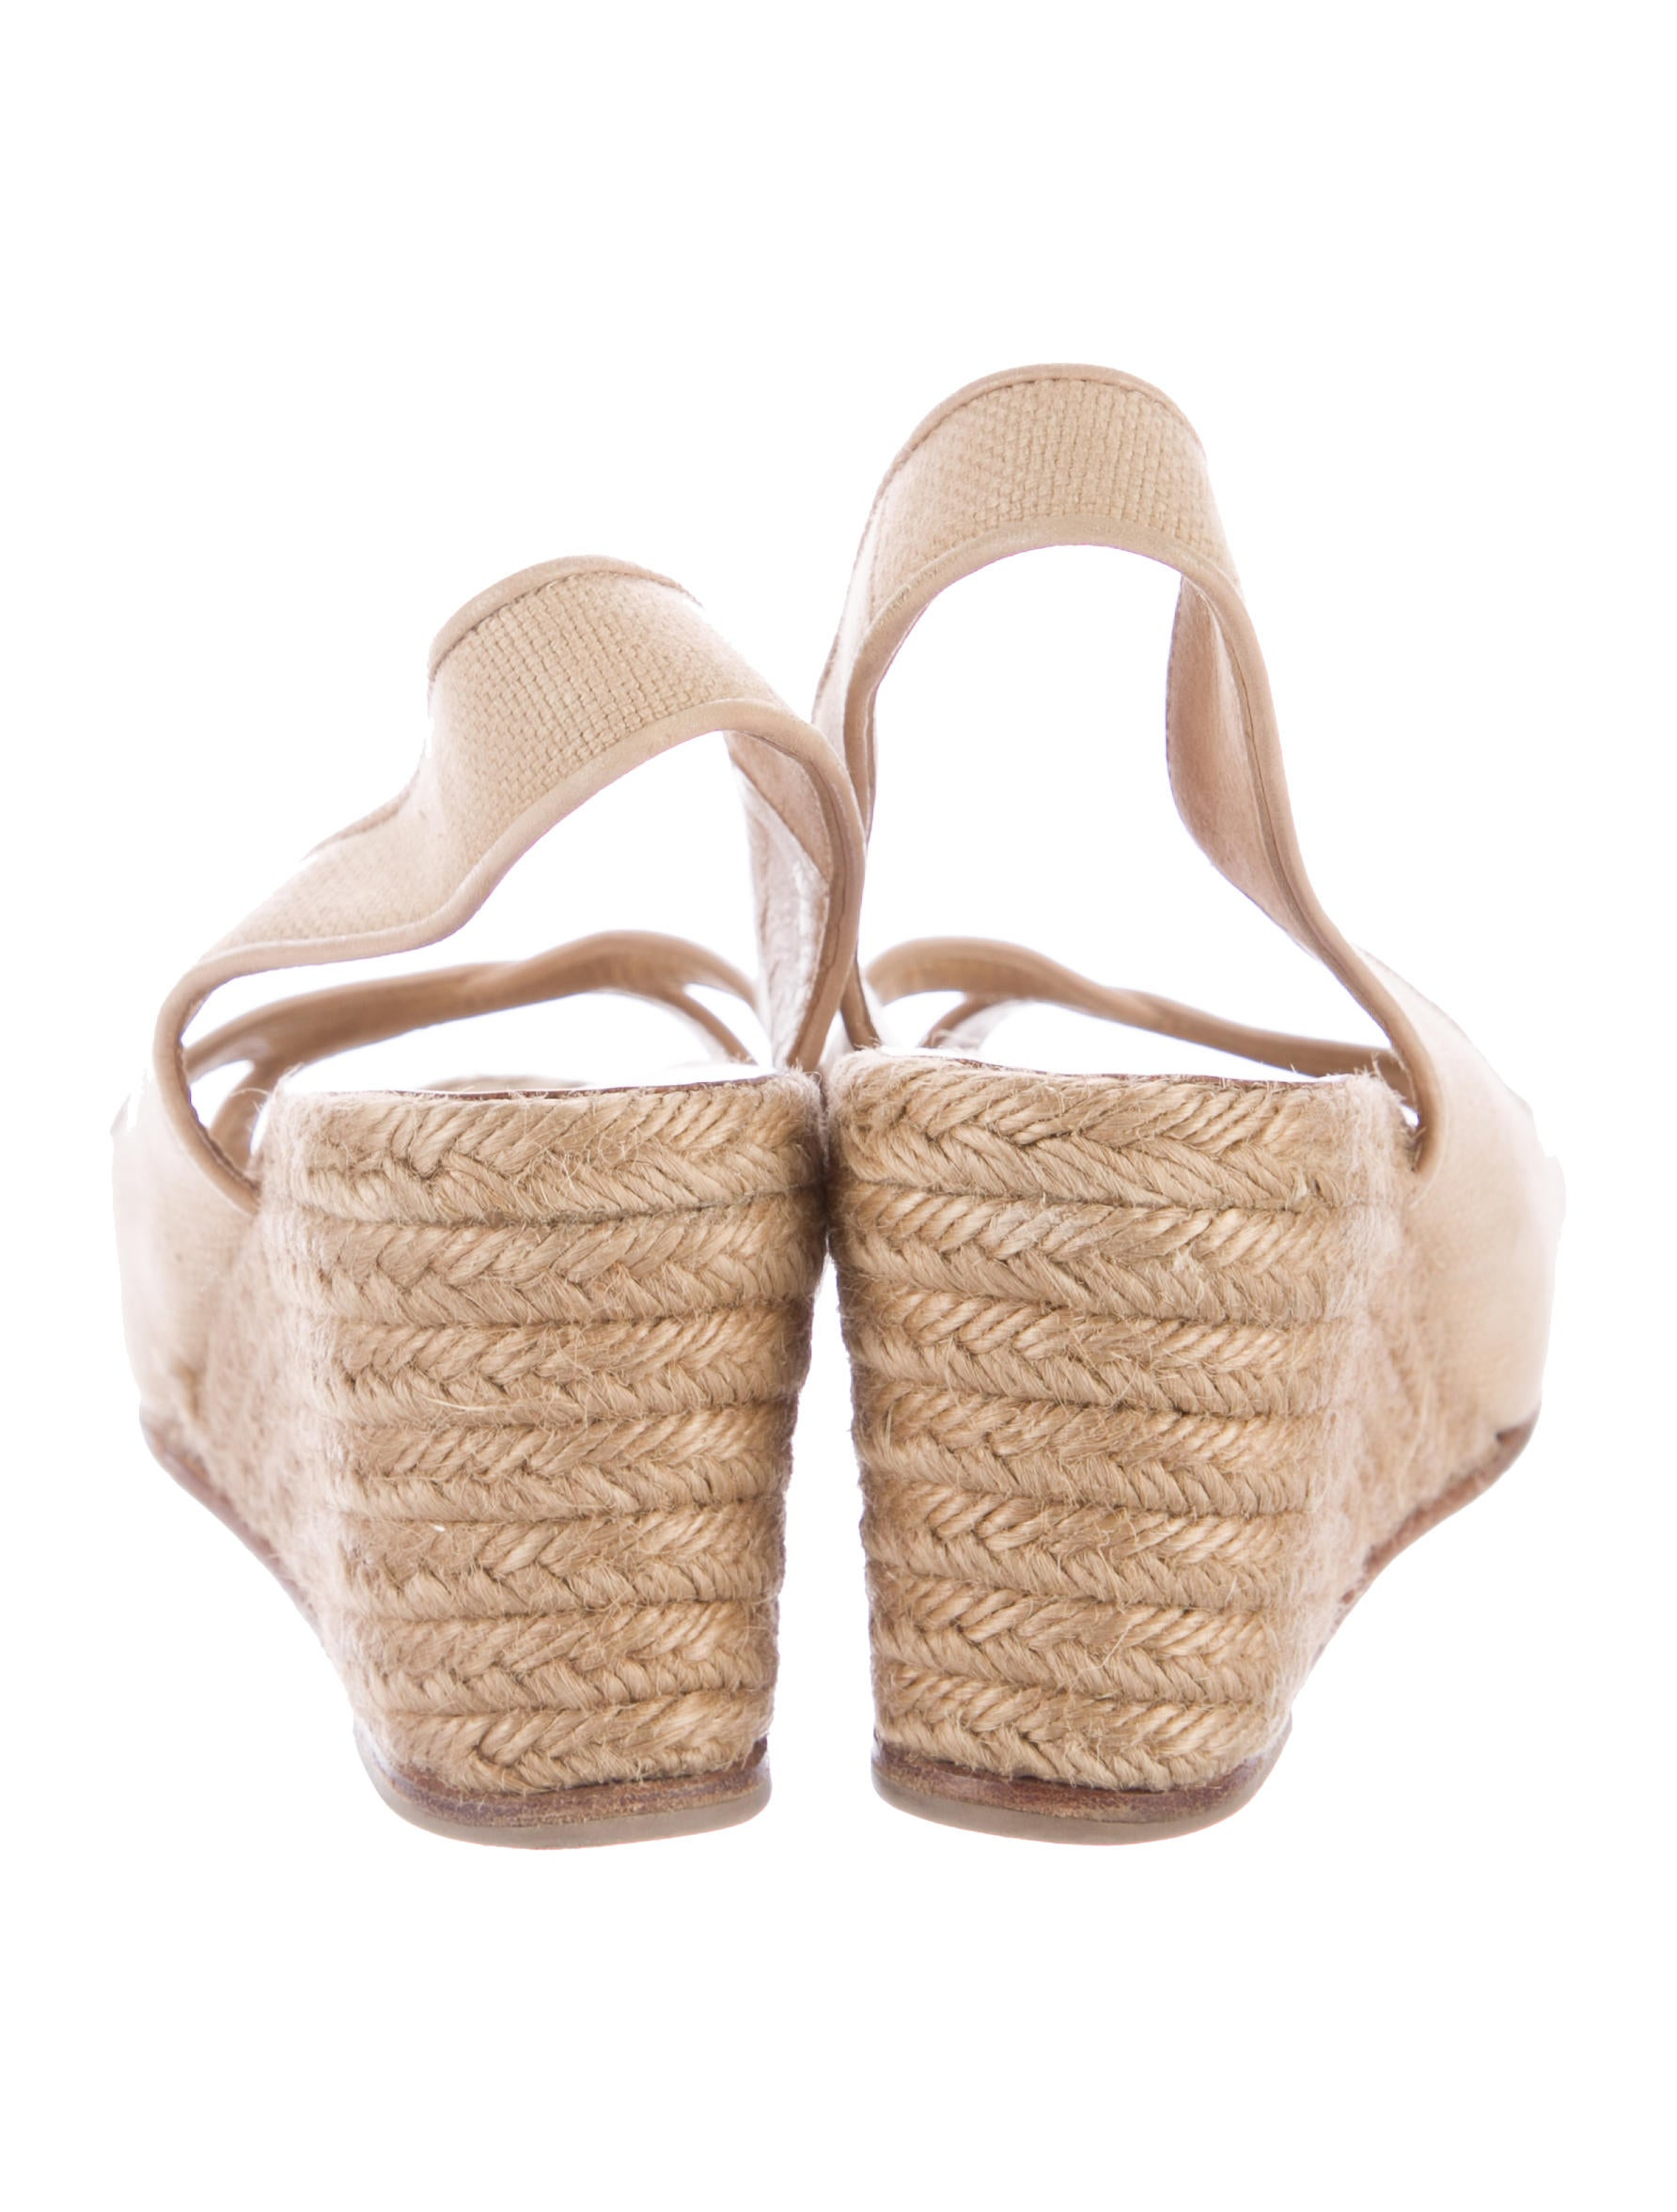 christian louboutin peep toe espadrille wedge sandals